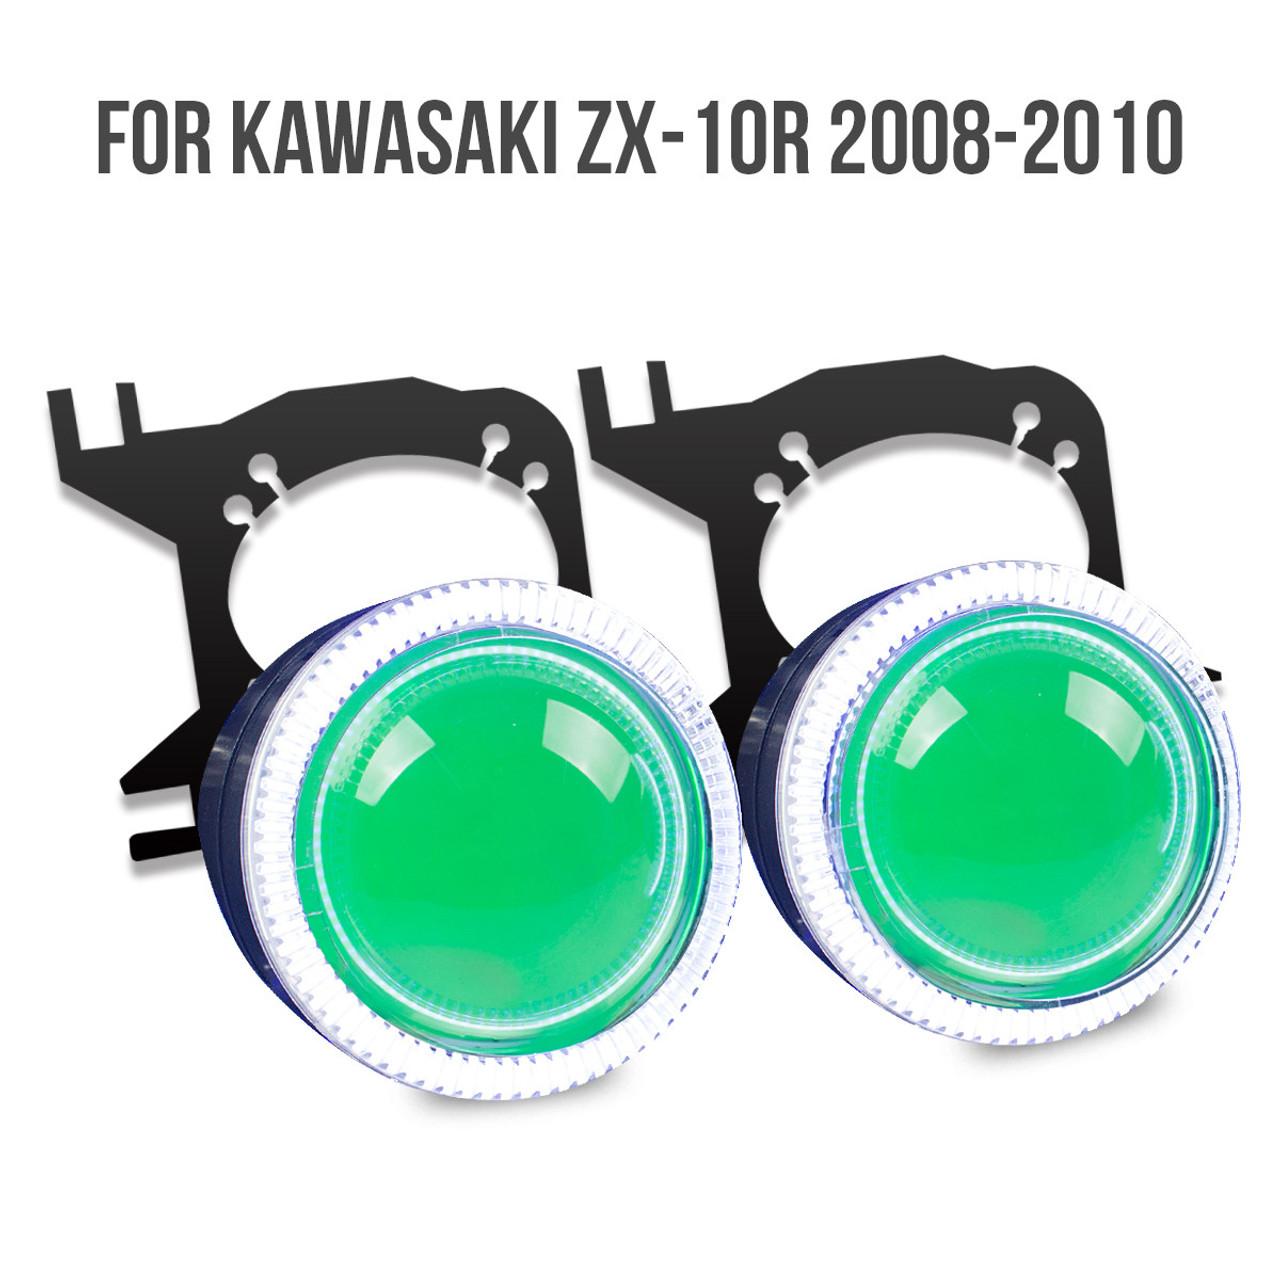 Kawasaki Zx 10r Hid Projector Kit 2008 2009 2010 Wiring Harness For 636